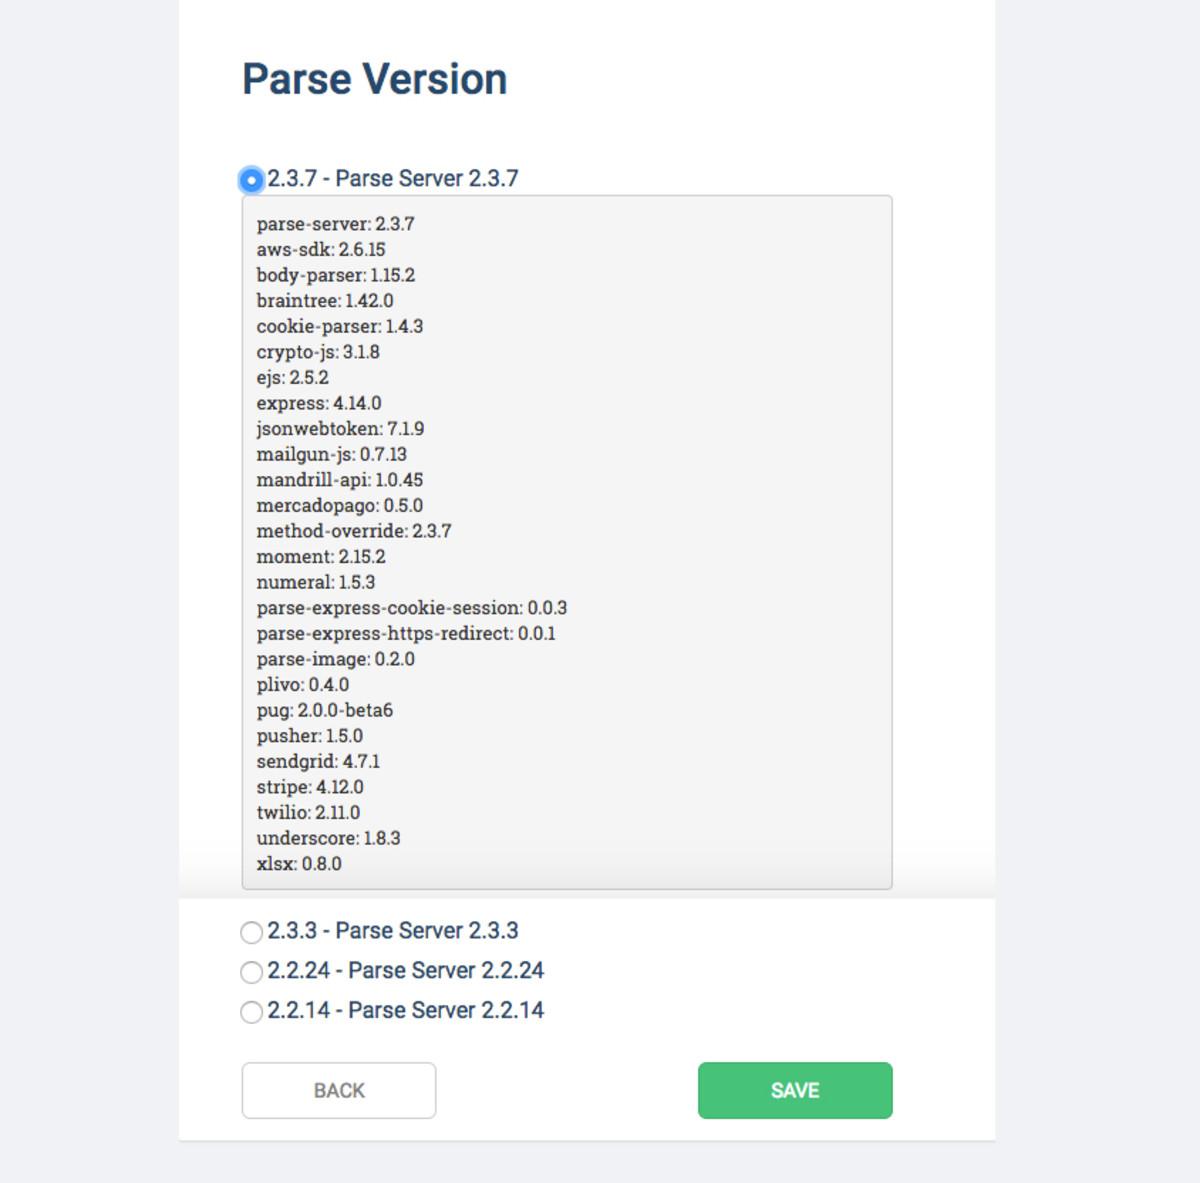 Select a Parse Server version